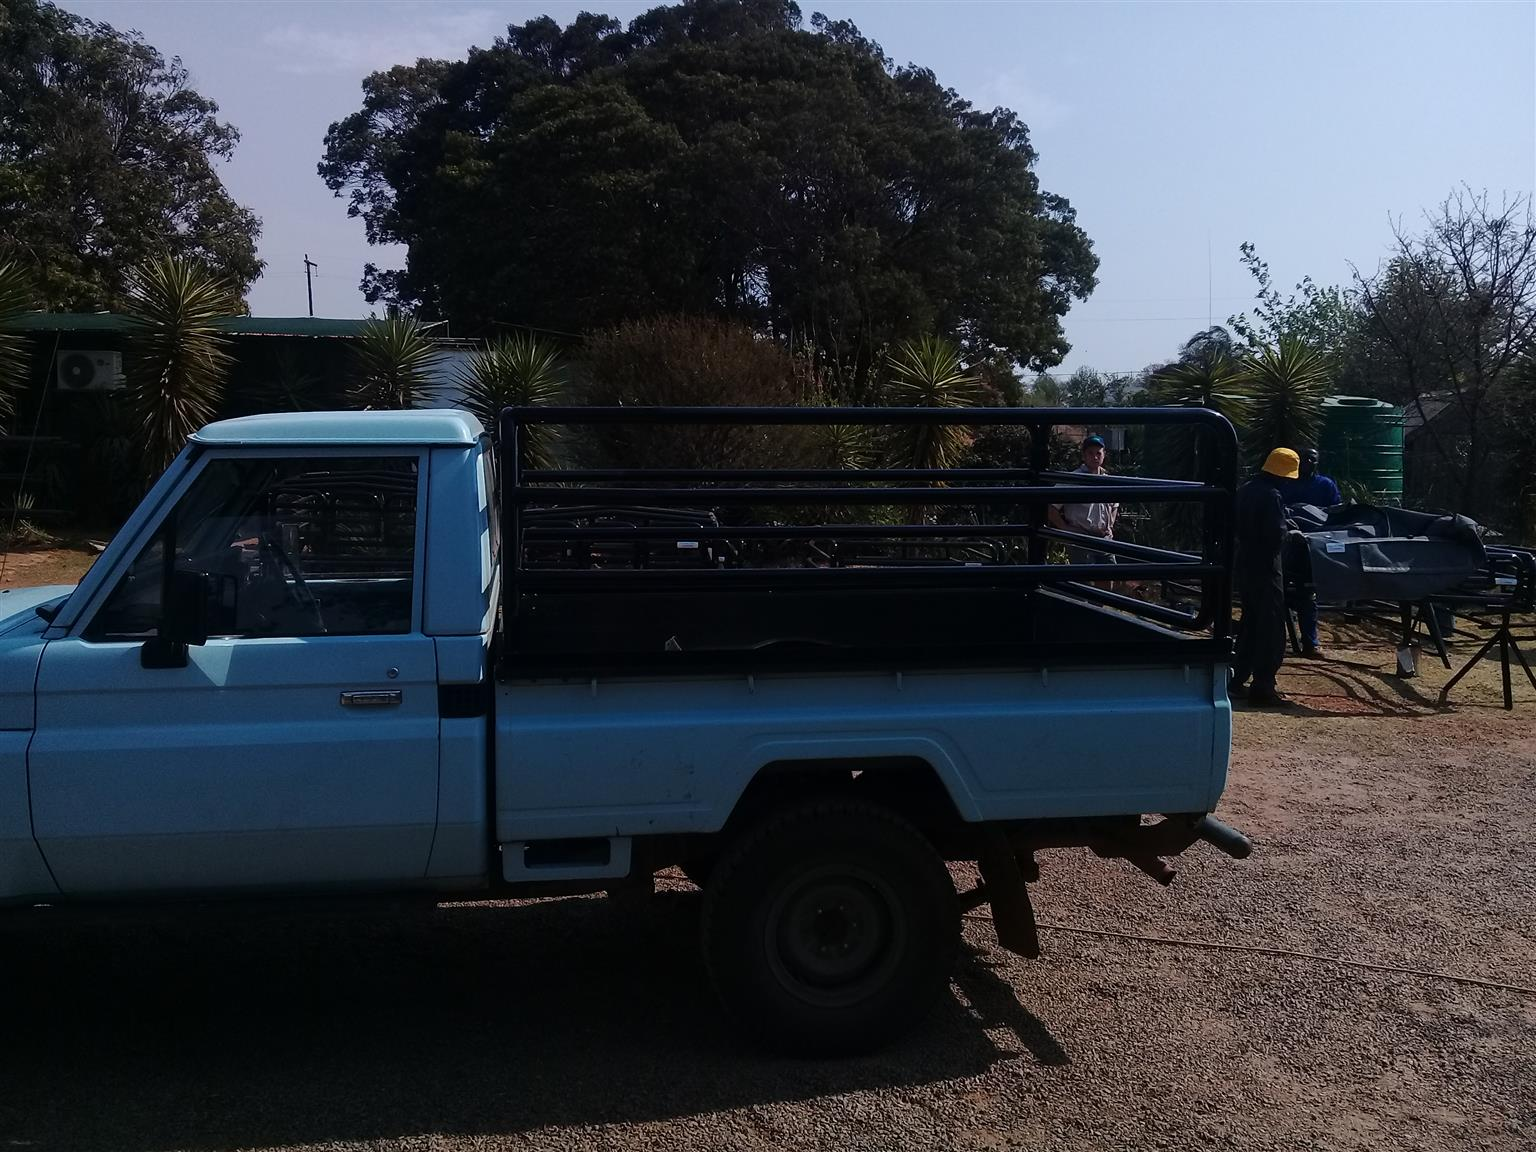 Land cruiser load bin pipe frame